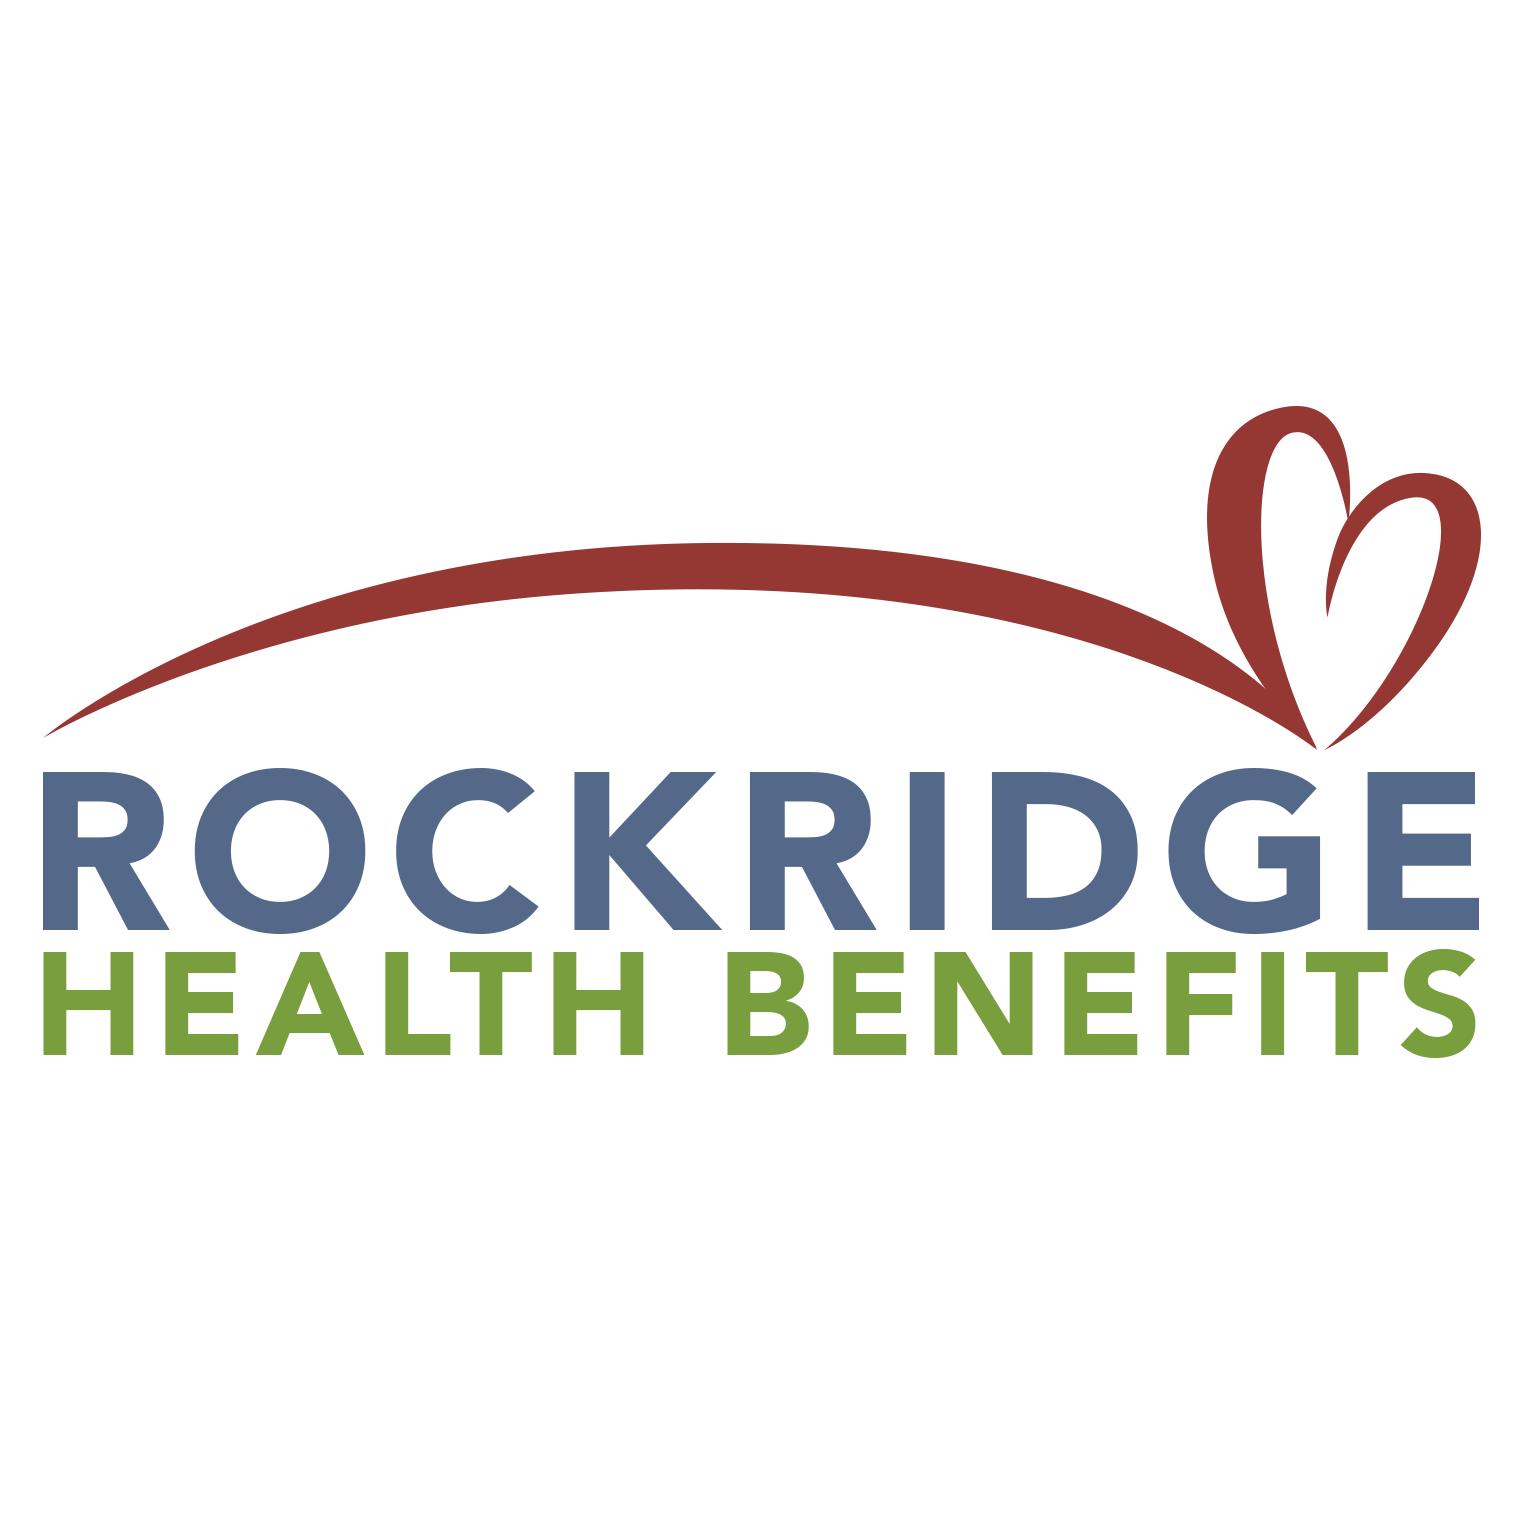 Rockridge Health Benefits image 3